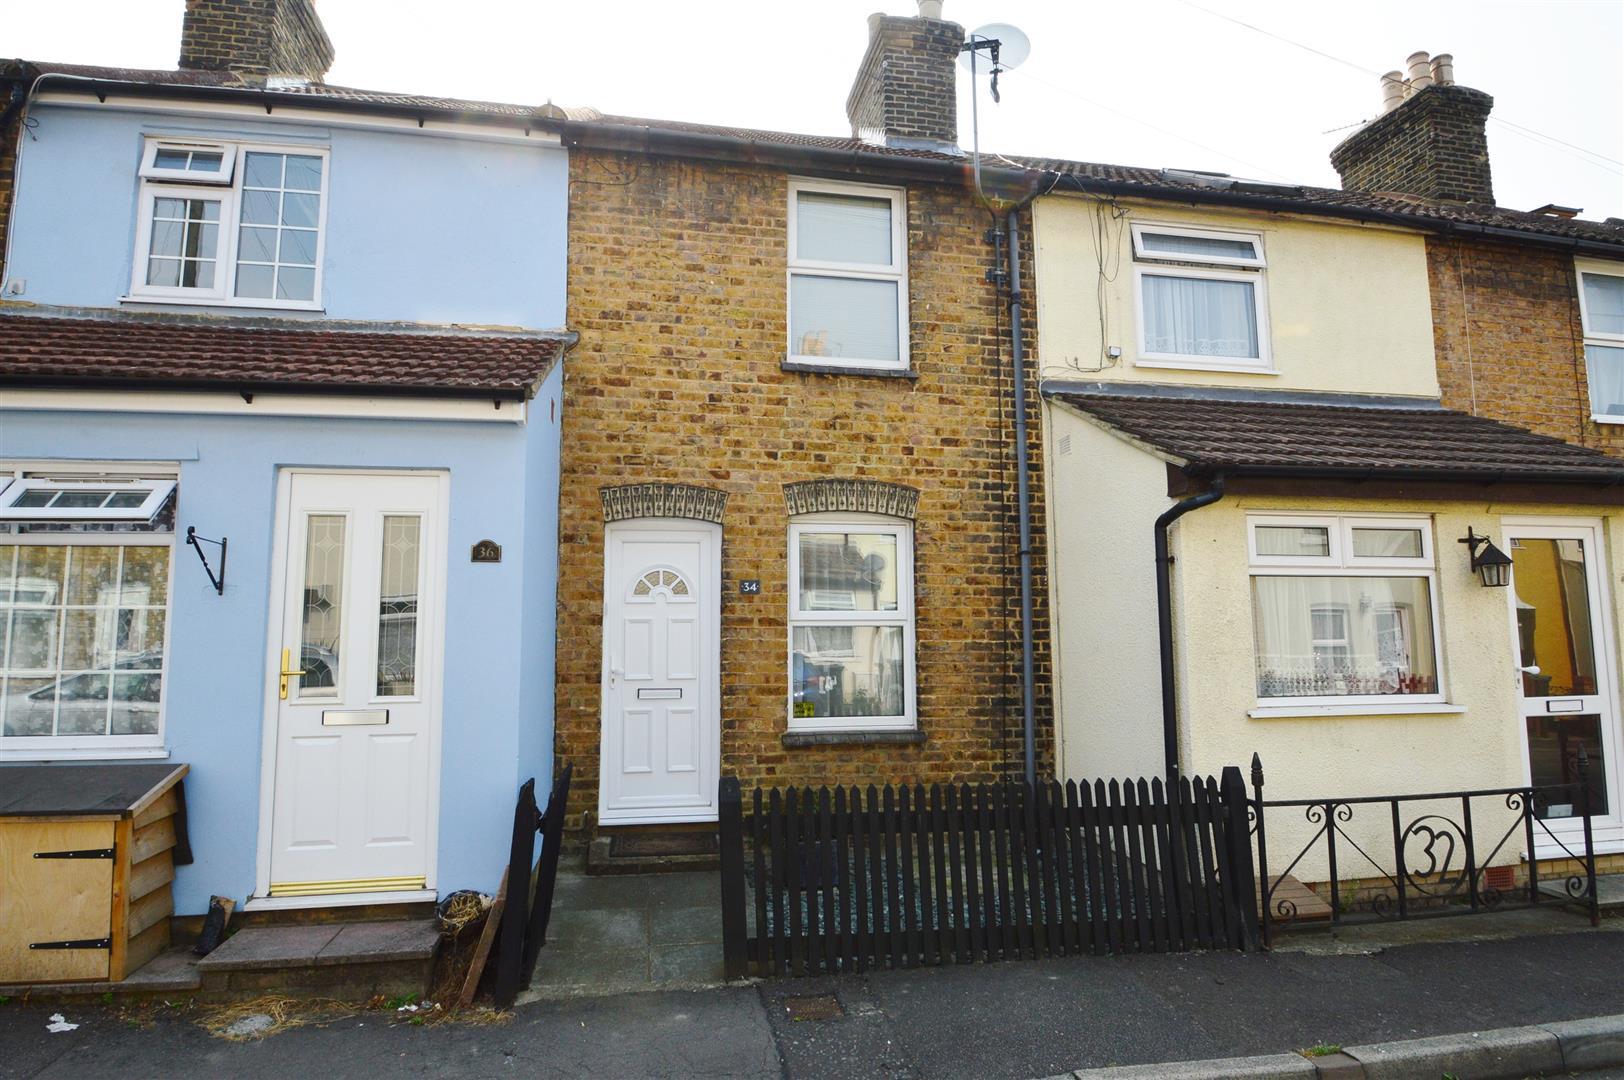 2 Bedrooms Terraced House for sale in Belgrave Street, Eccles